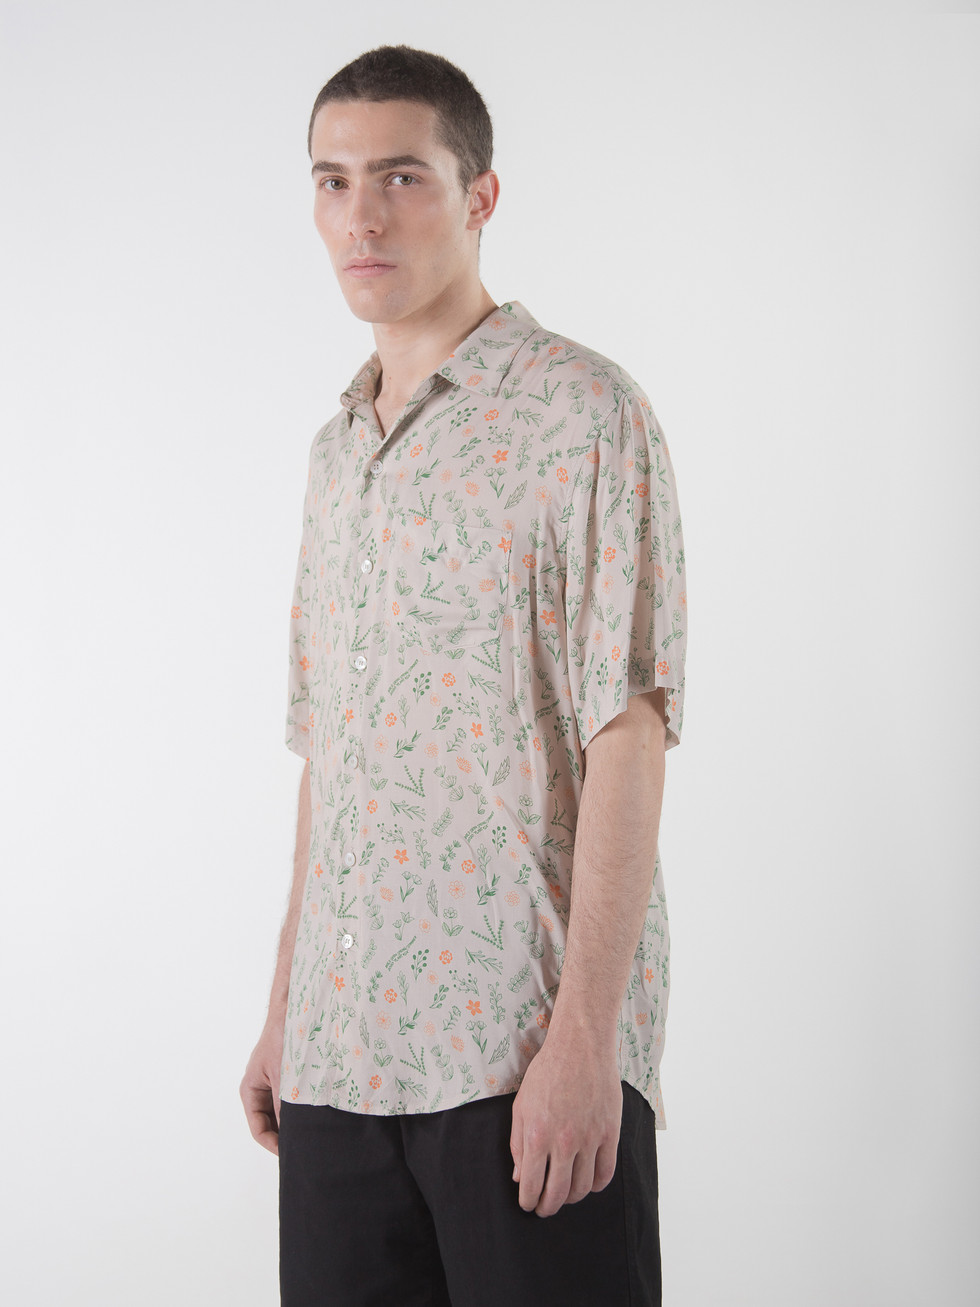 09_rold_skov_ss20_plantasia_shirt-08.jpg